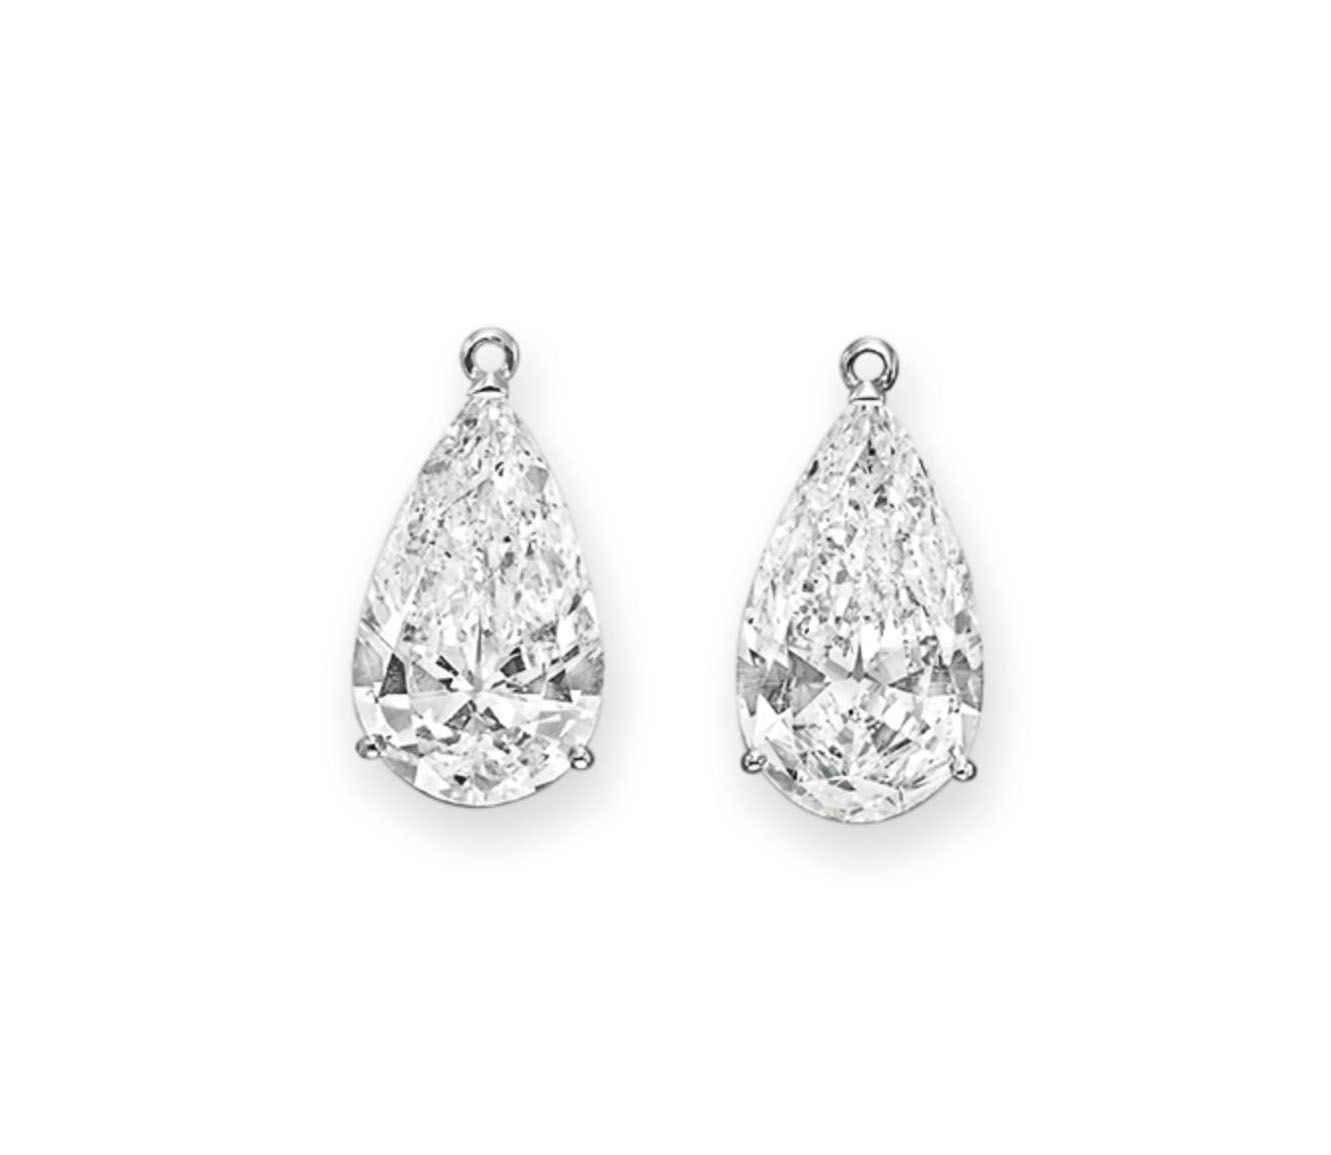 A PAIR OF DIAMOND PENDANTS